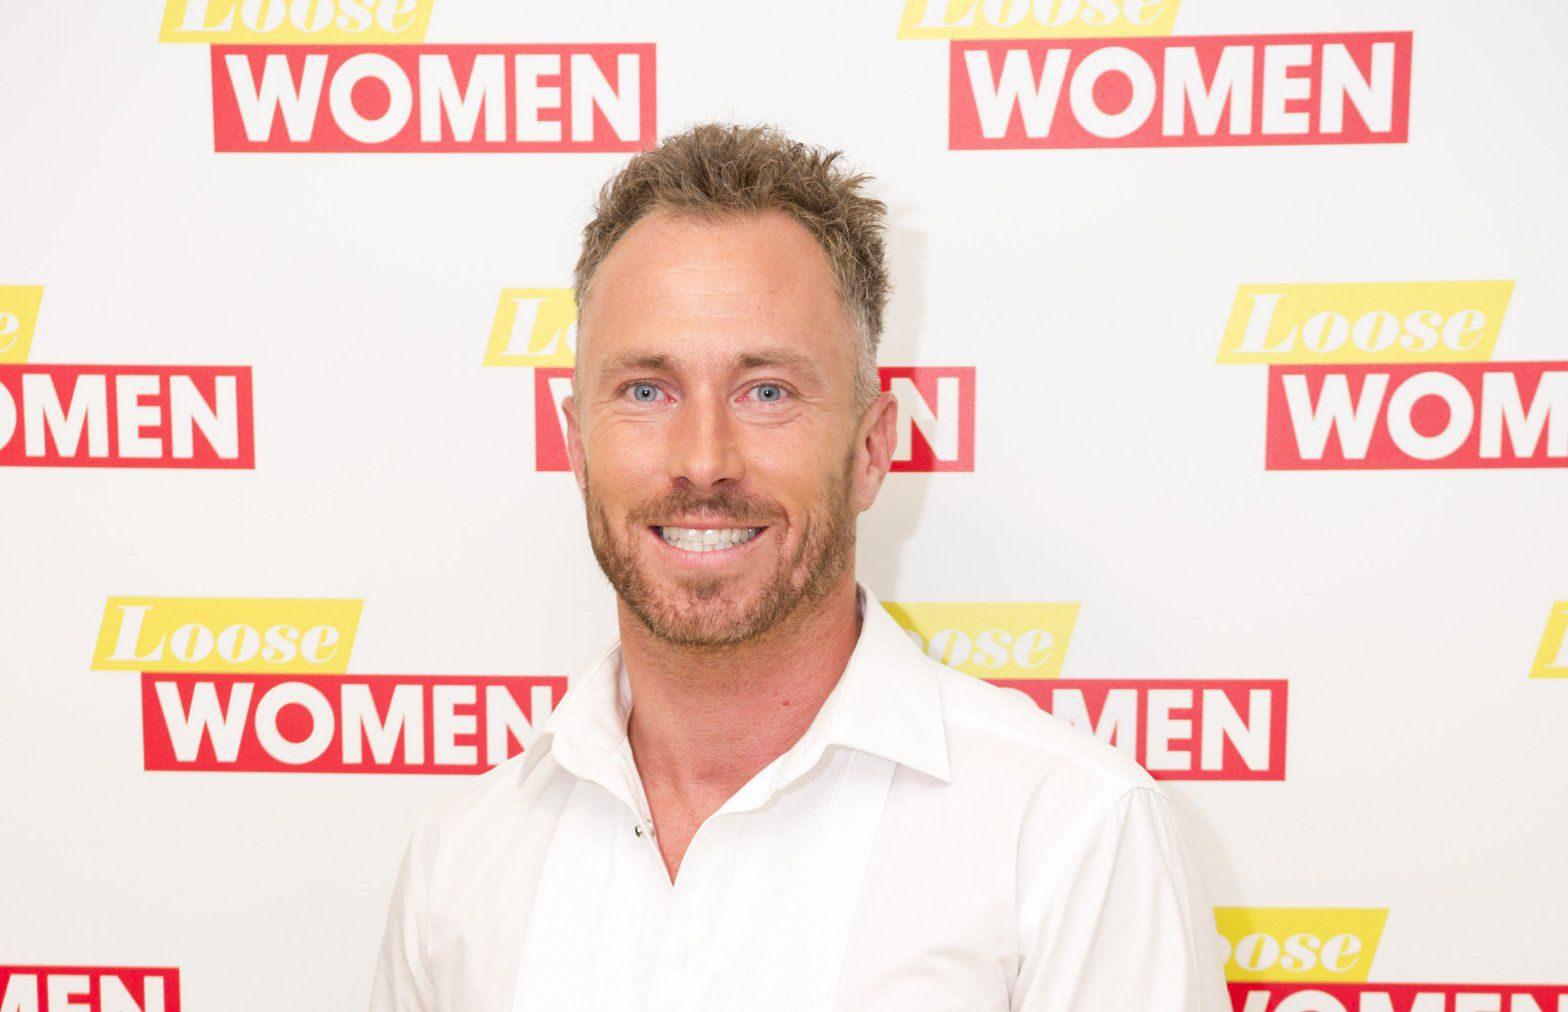 EDITORIAL USE ONLY. NO MERCHANDISINGnMandatory Credit: Photo by Ken McKay/ITV/REX/Shutterstock (6027784af)nJames Jordann'Loose Women' TV show, London, UK - 27 Sep 2016nn